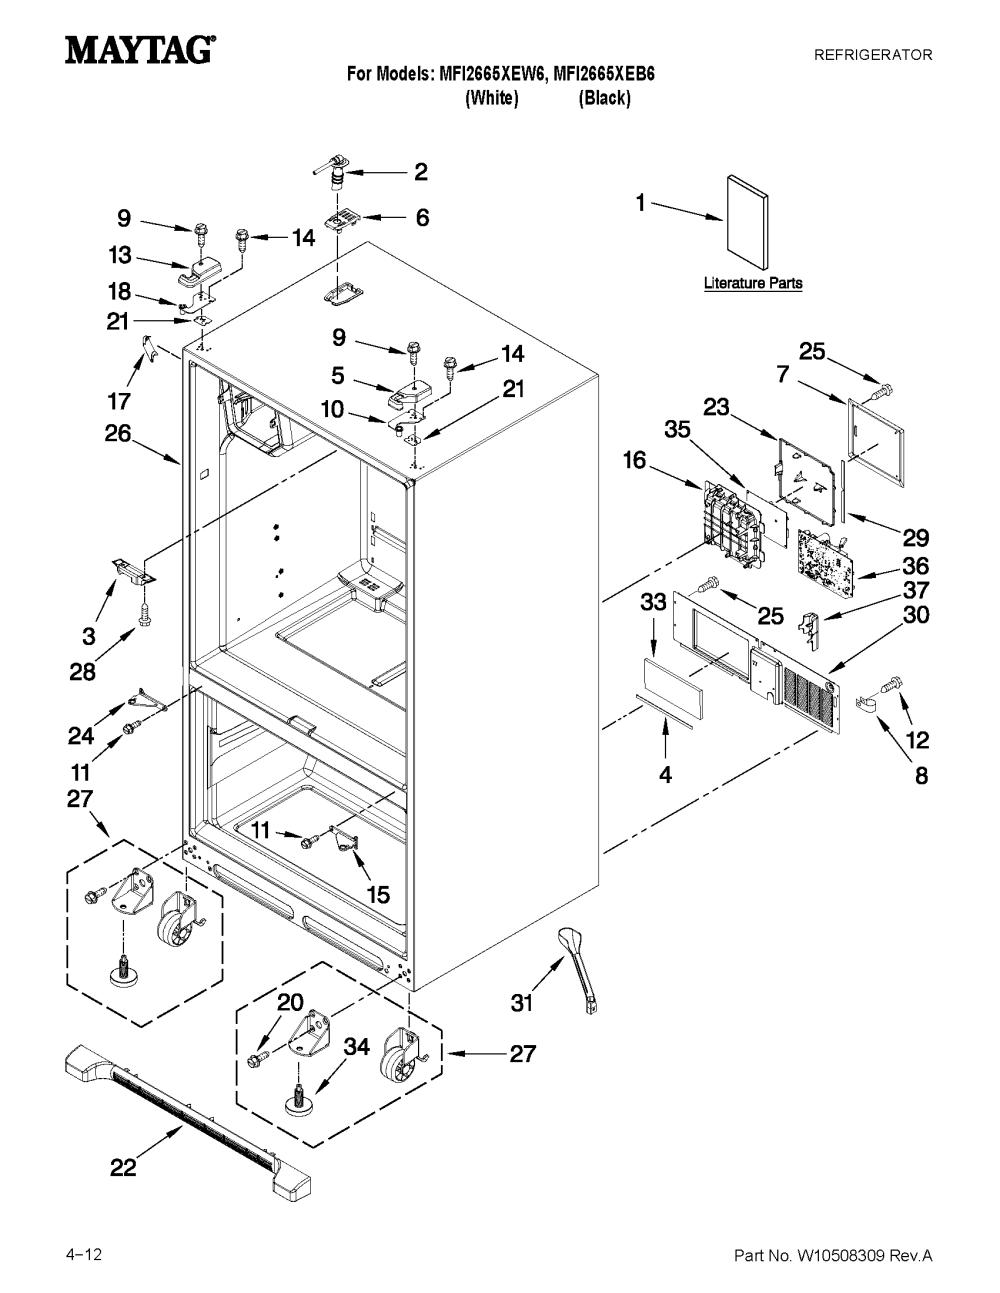 medium resolution of maytag mfi2665xew6 wiring schematic wiring diagrams simplemaytag model mfi2665xew6 bottom mount refrigerator genuine parts maytag mfi2665xew6